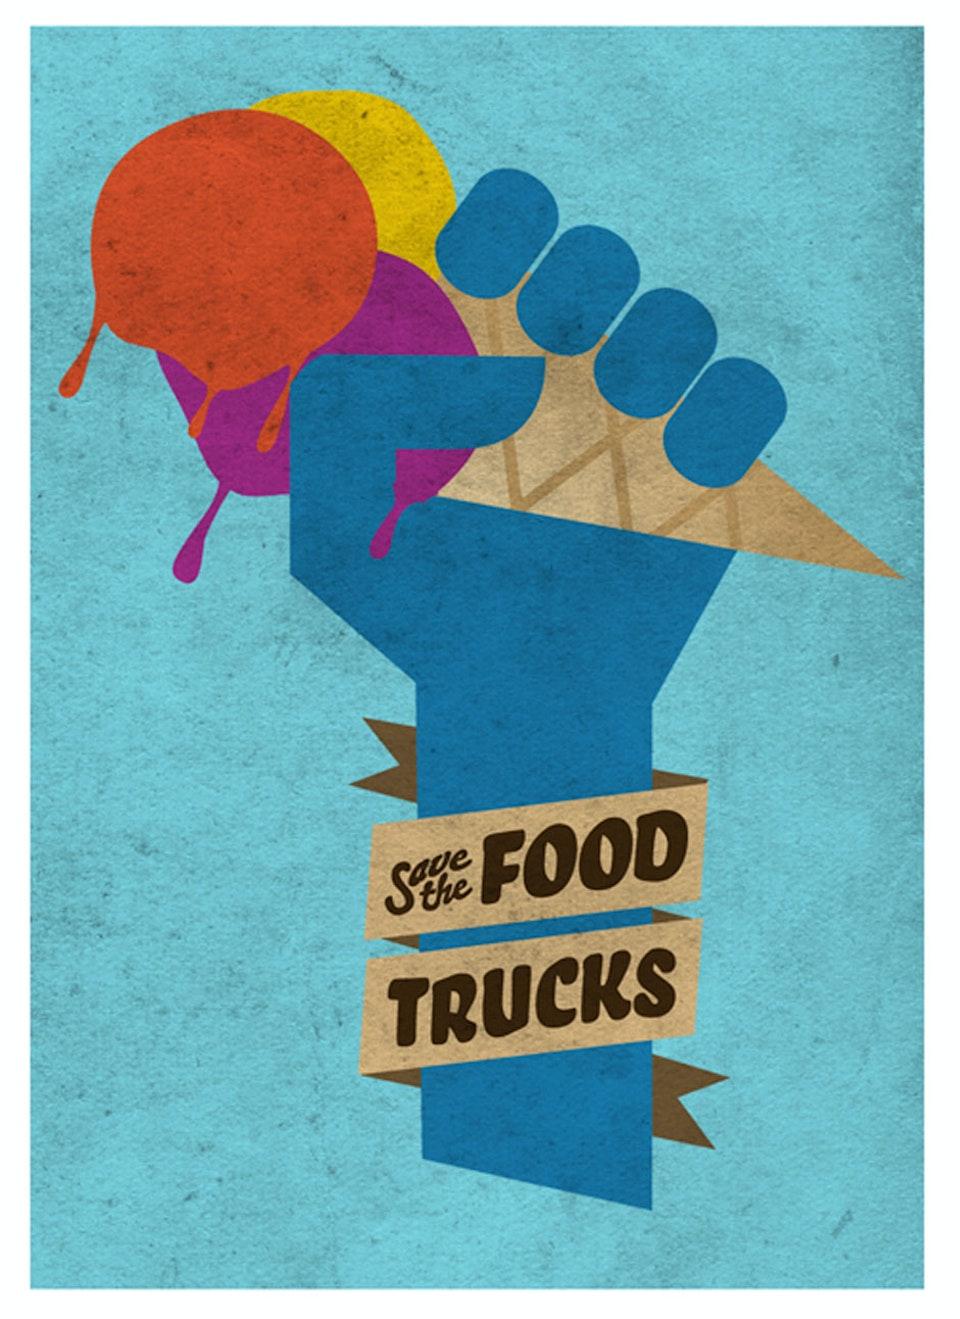 Save the Food Trucks - Postcard